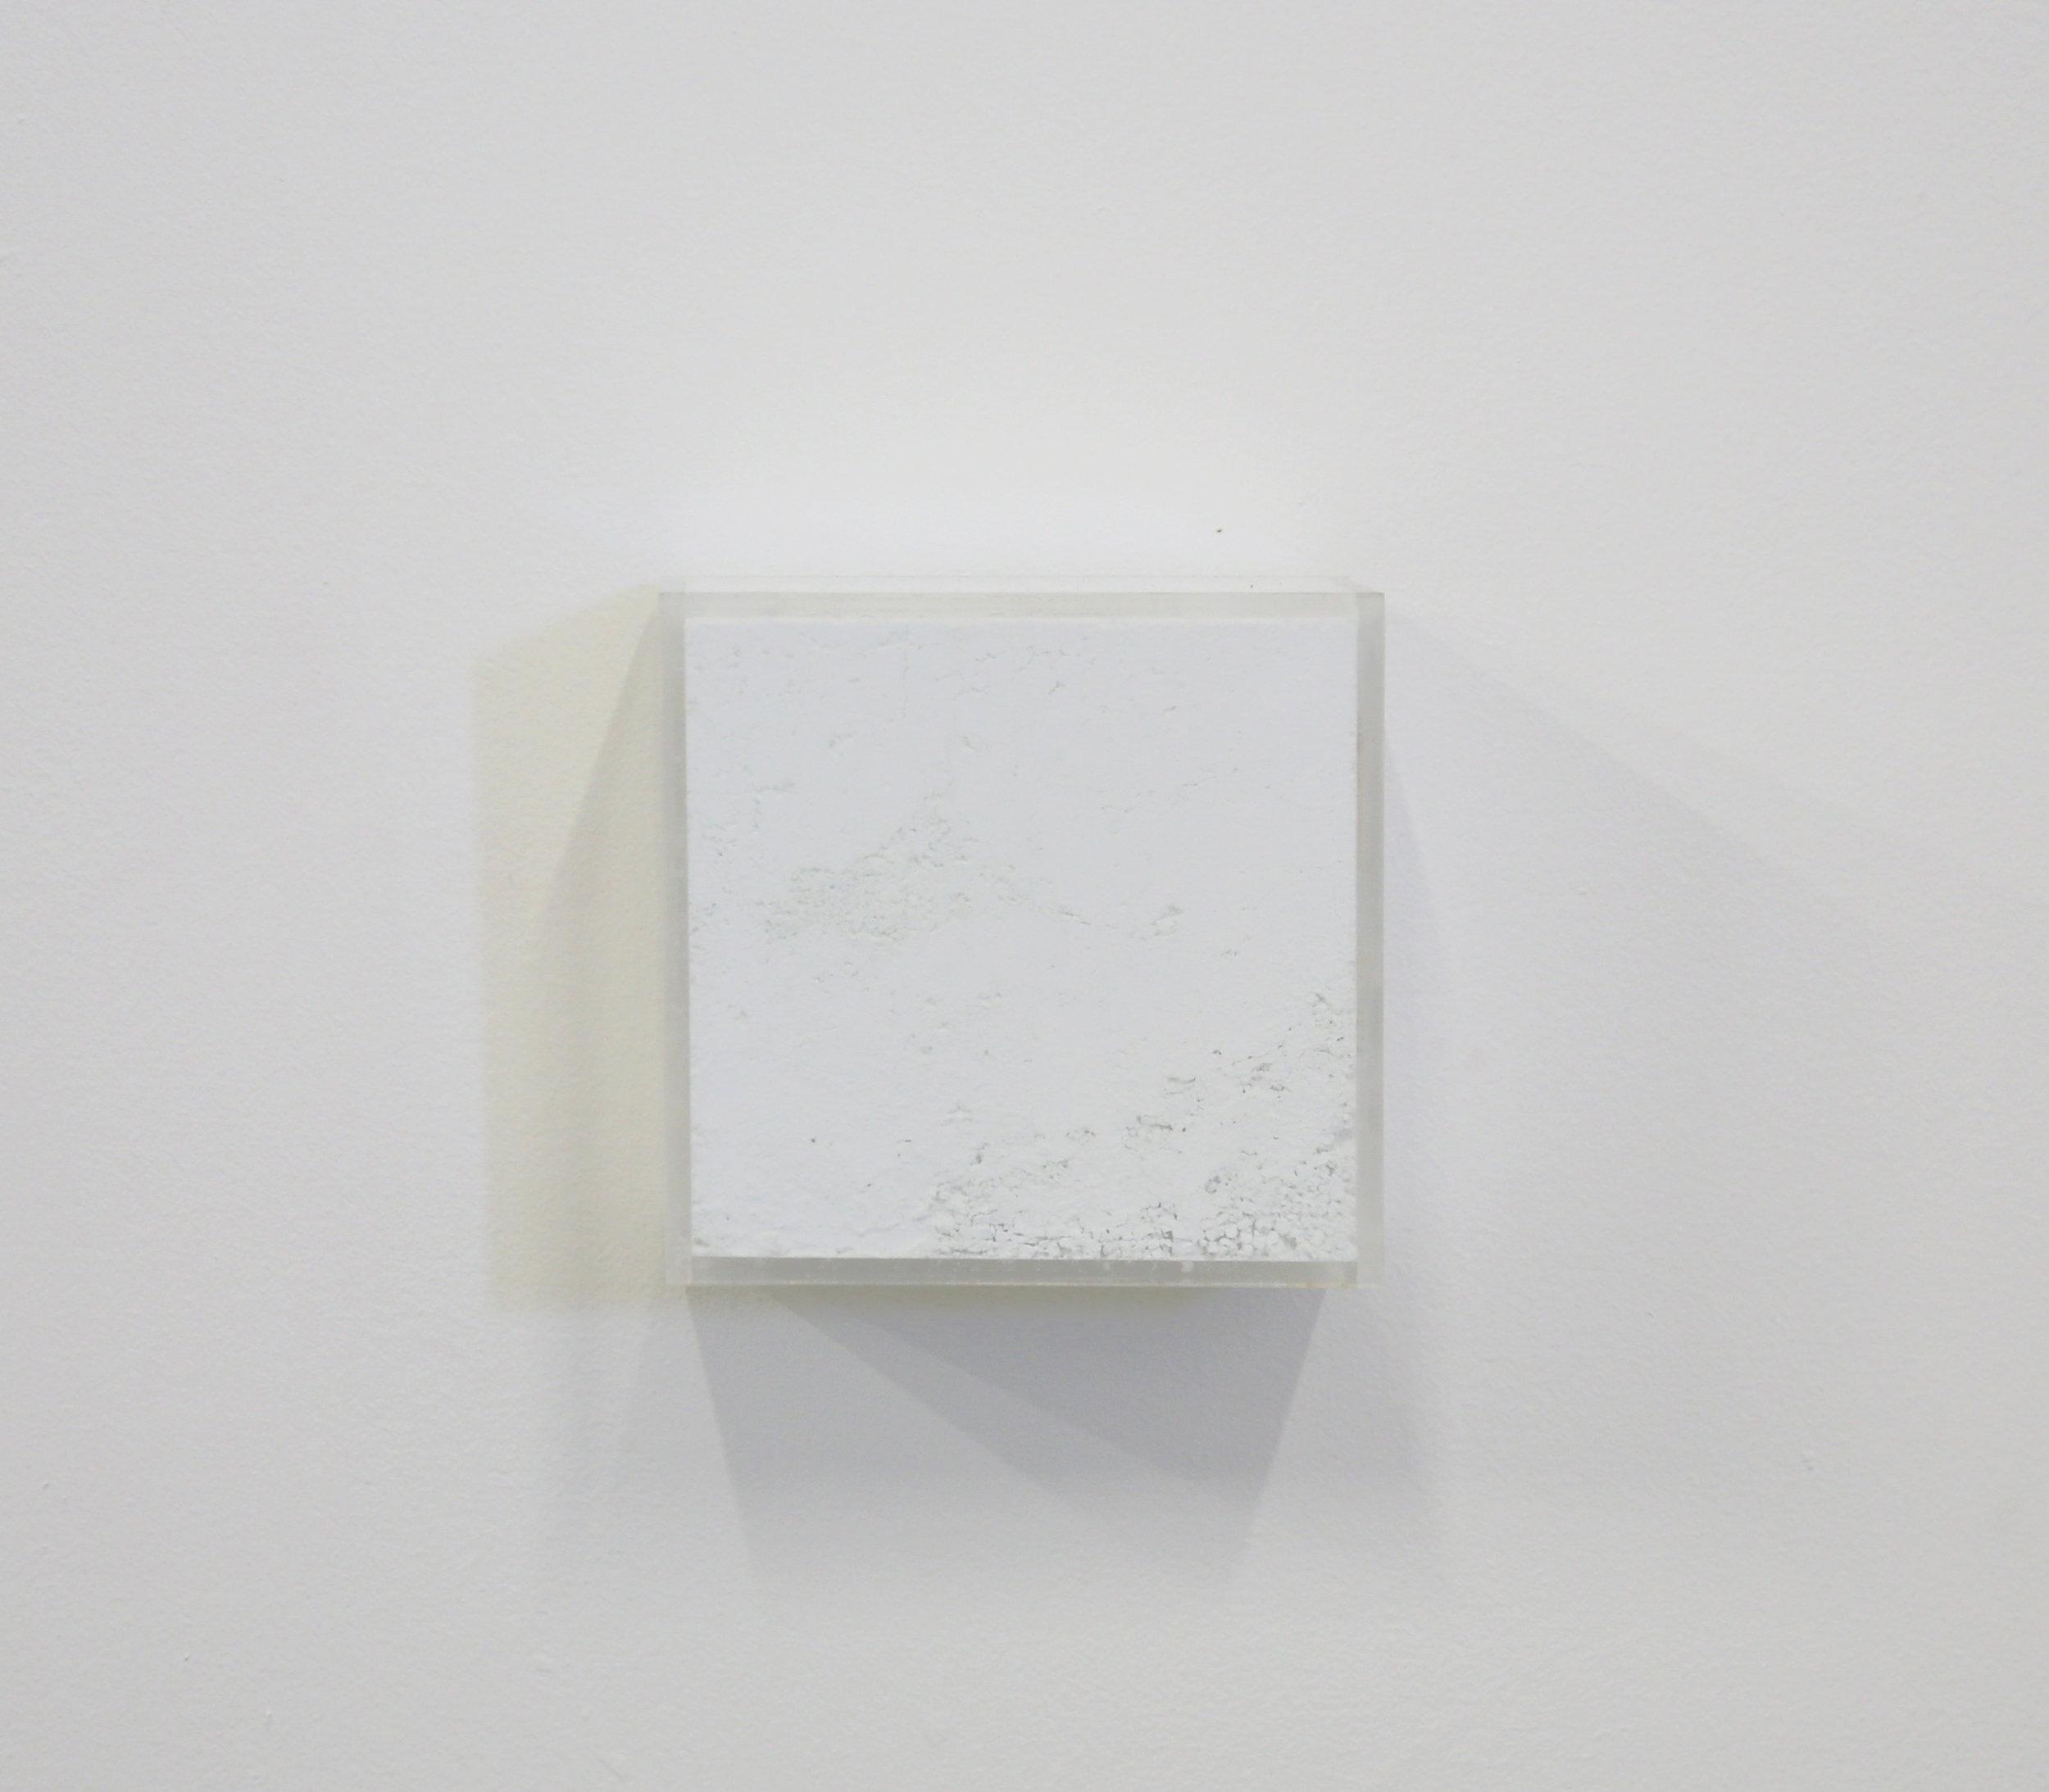 "White Box painting  ,         Raw Pigments in Plexiglas box    10x2 1⁄2""x10"" 2018"